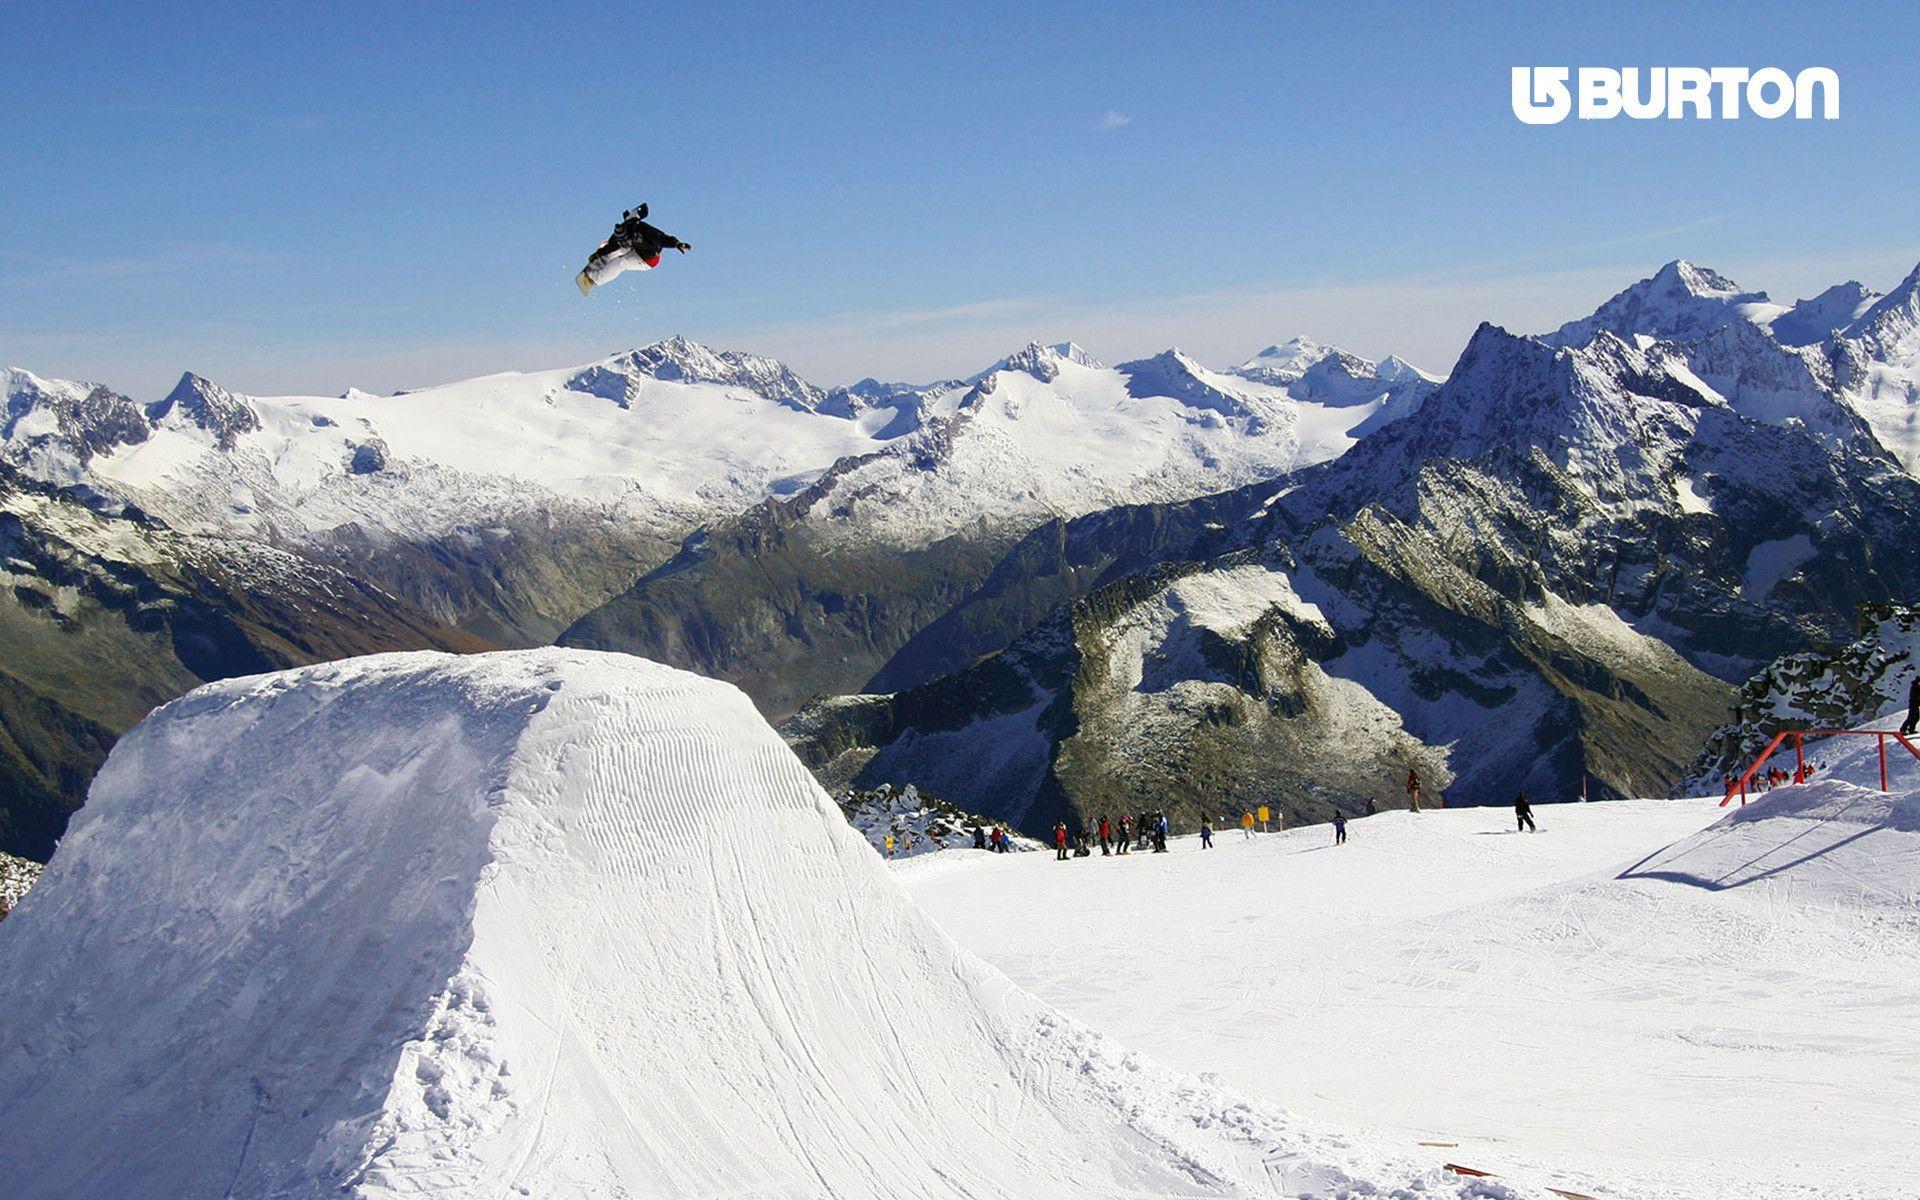 Snowboard wallpapers hd